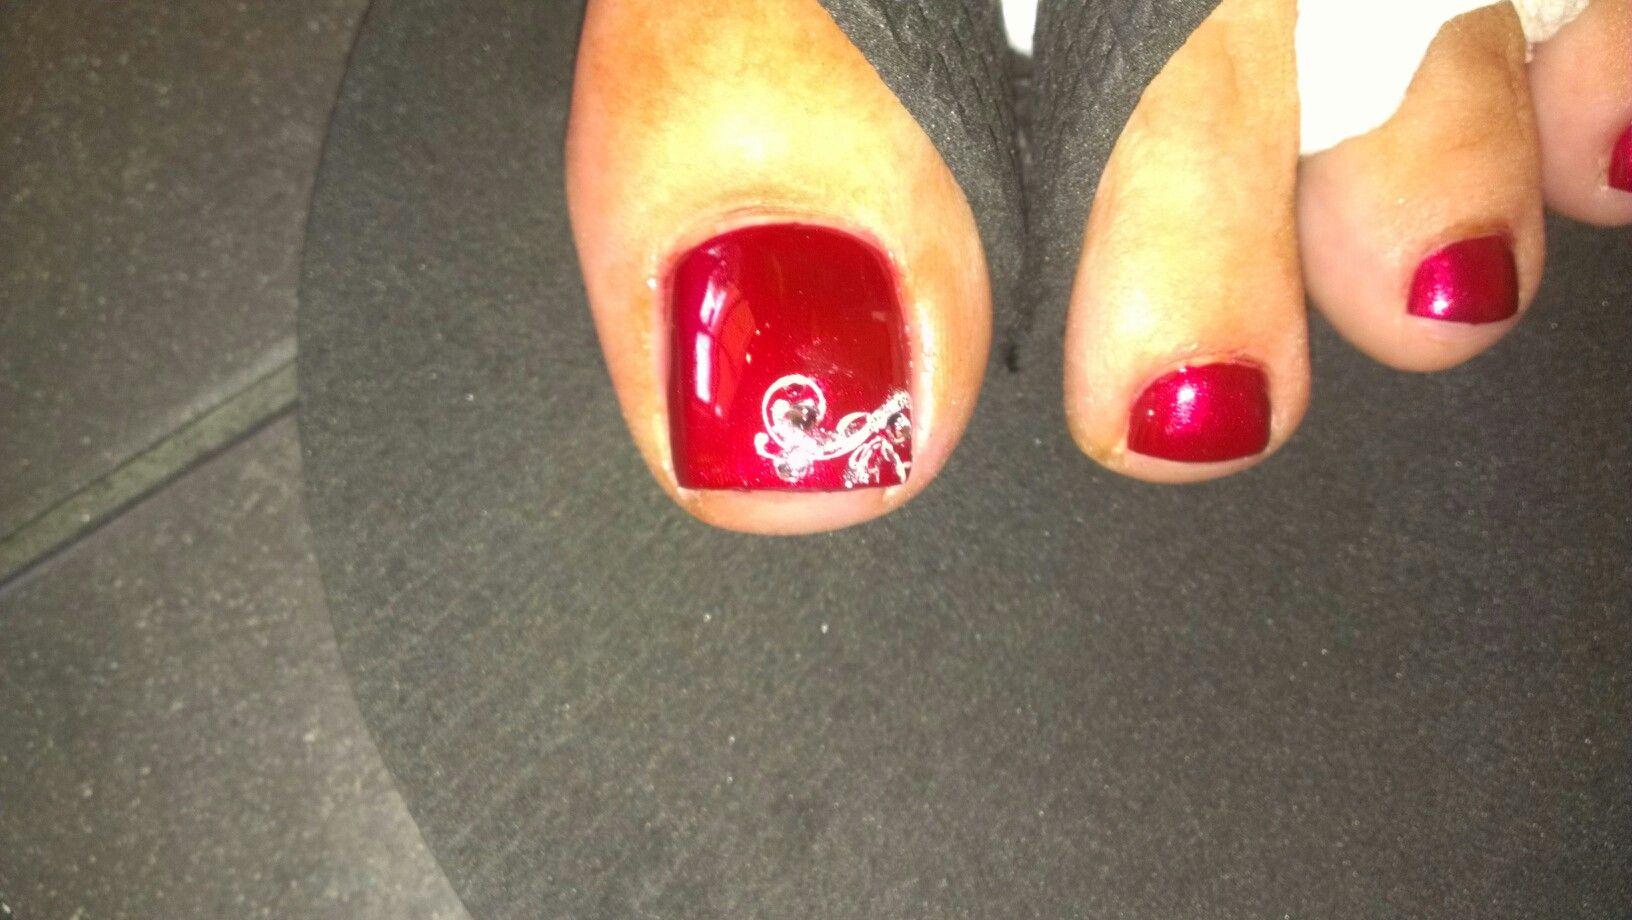 Fancy toe nail design | Nails | Pinterest | Toe nail designs ...